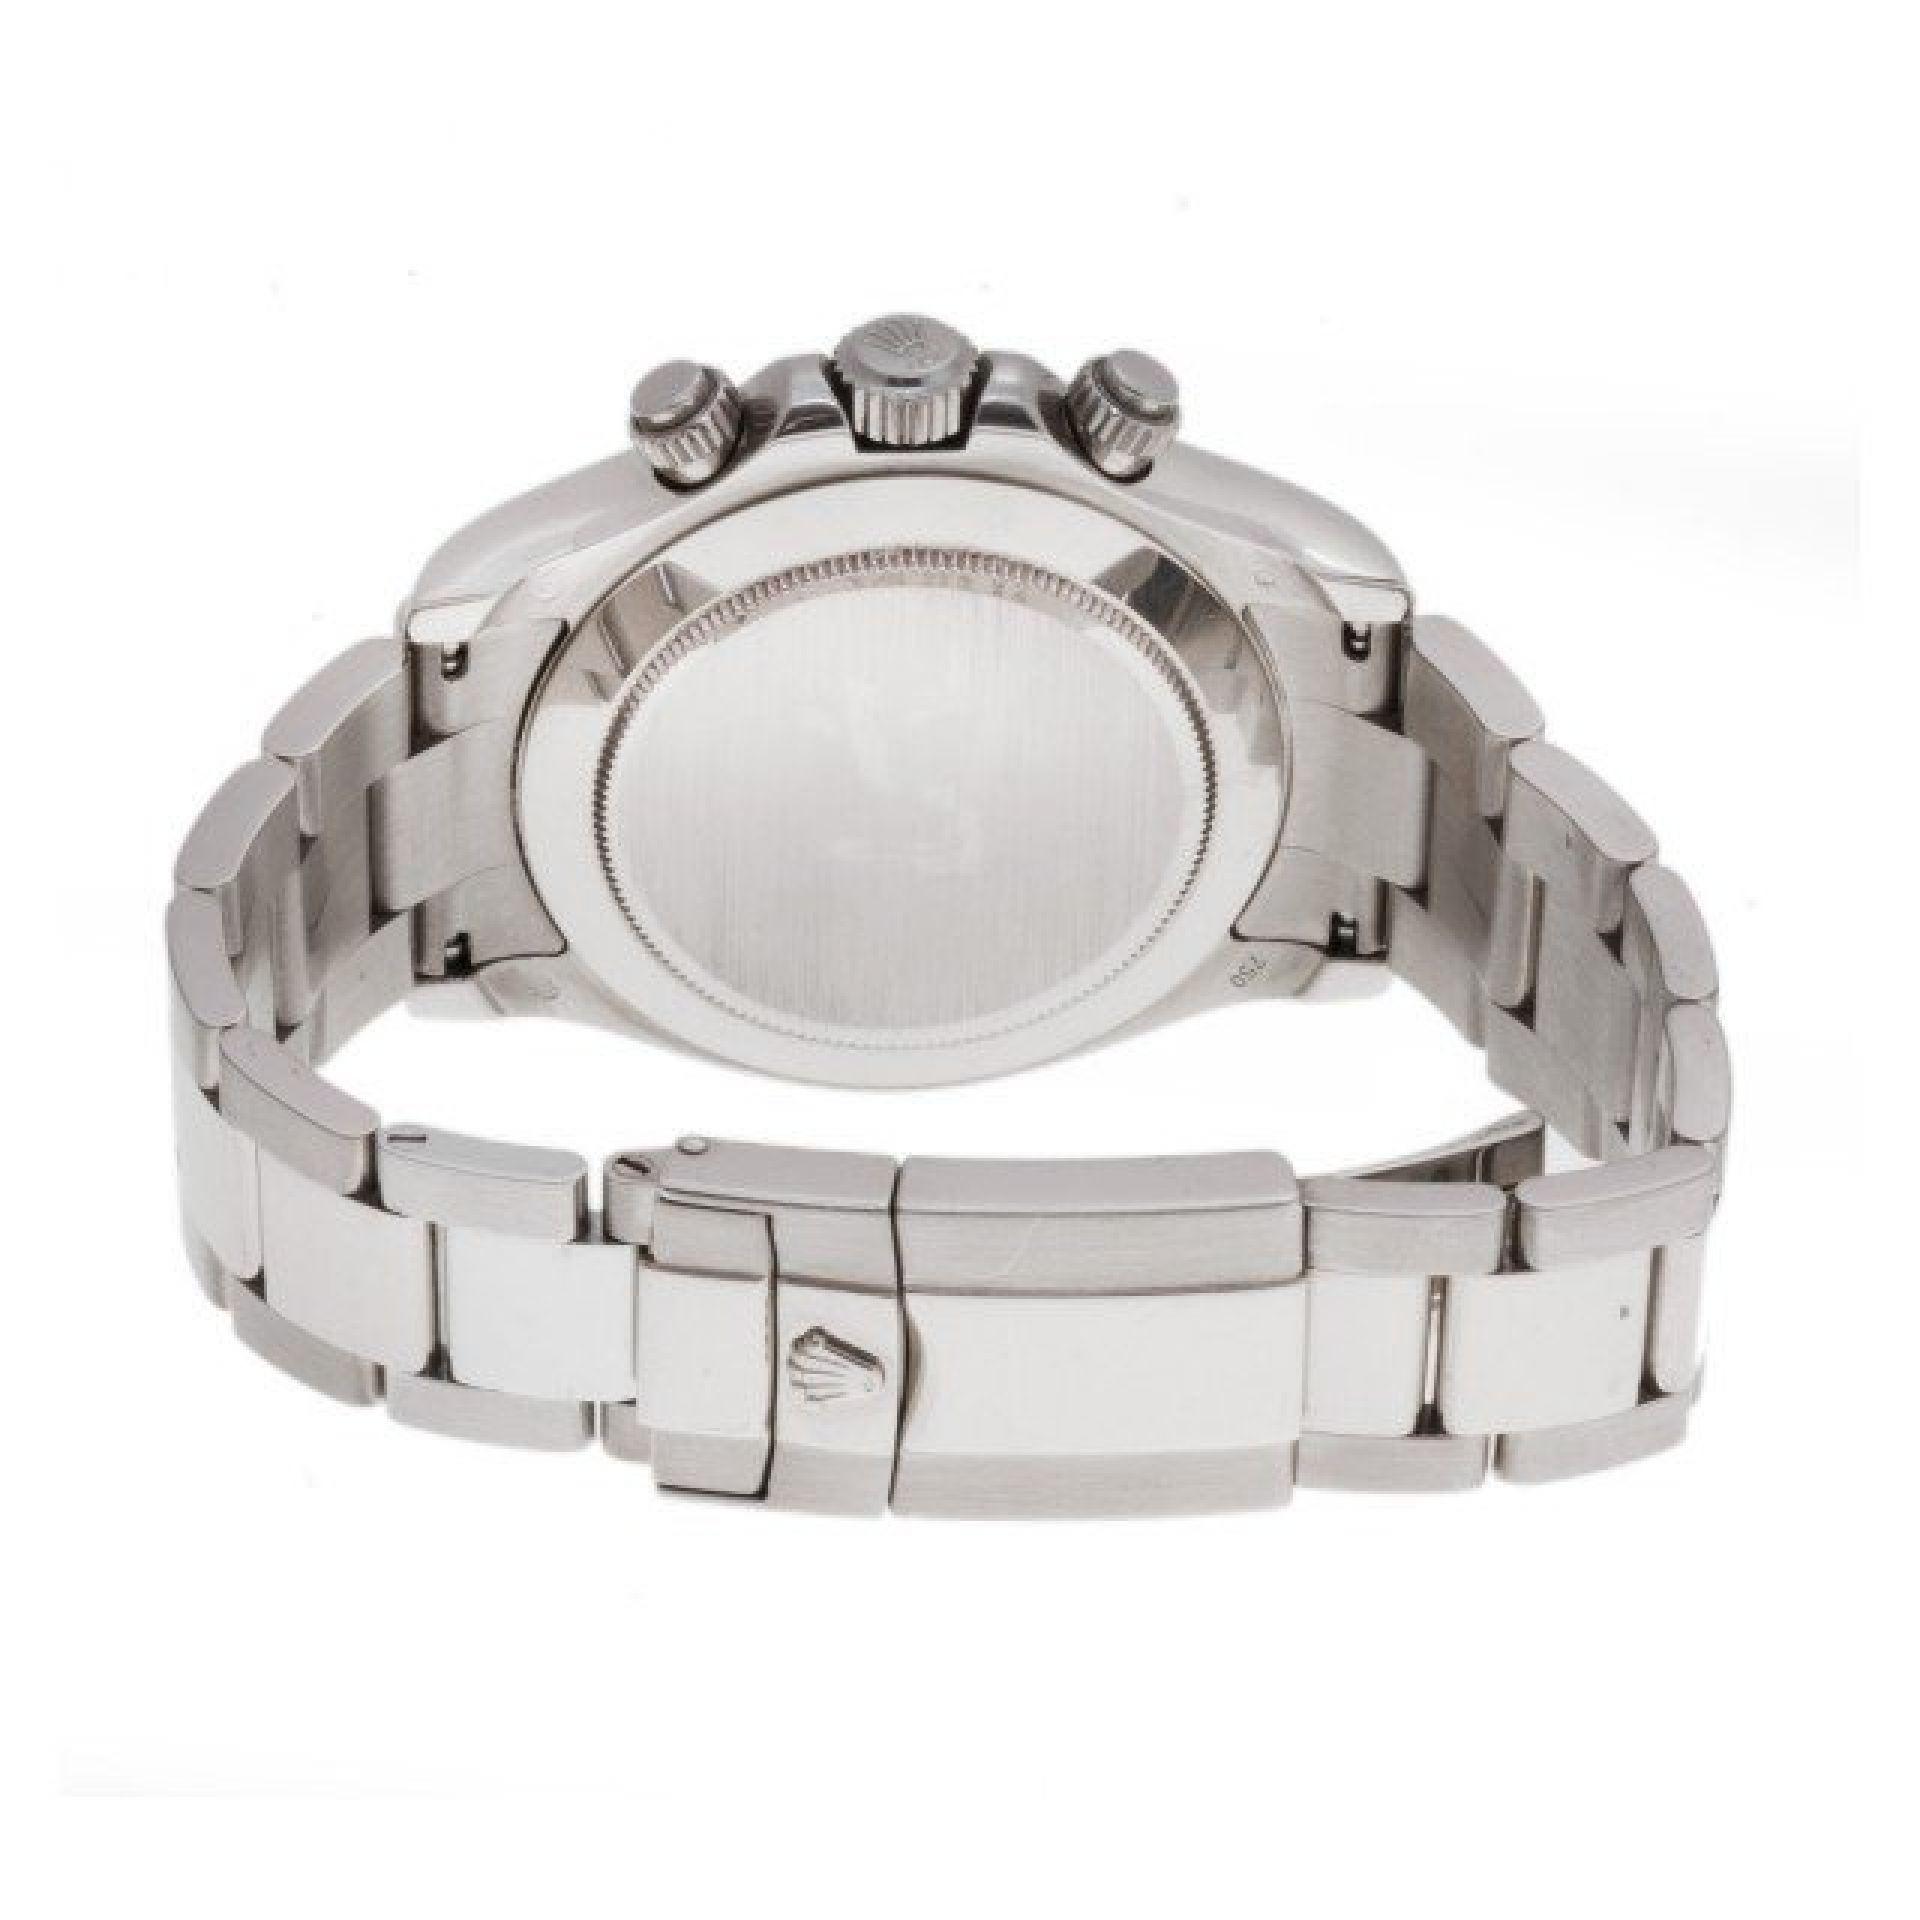 Rolex Daytona 116509 18k white gold Silver dial 40mm auto watch